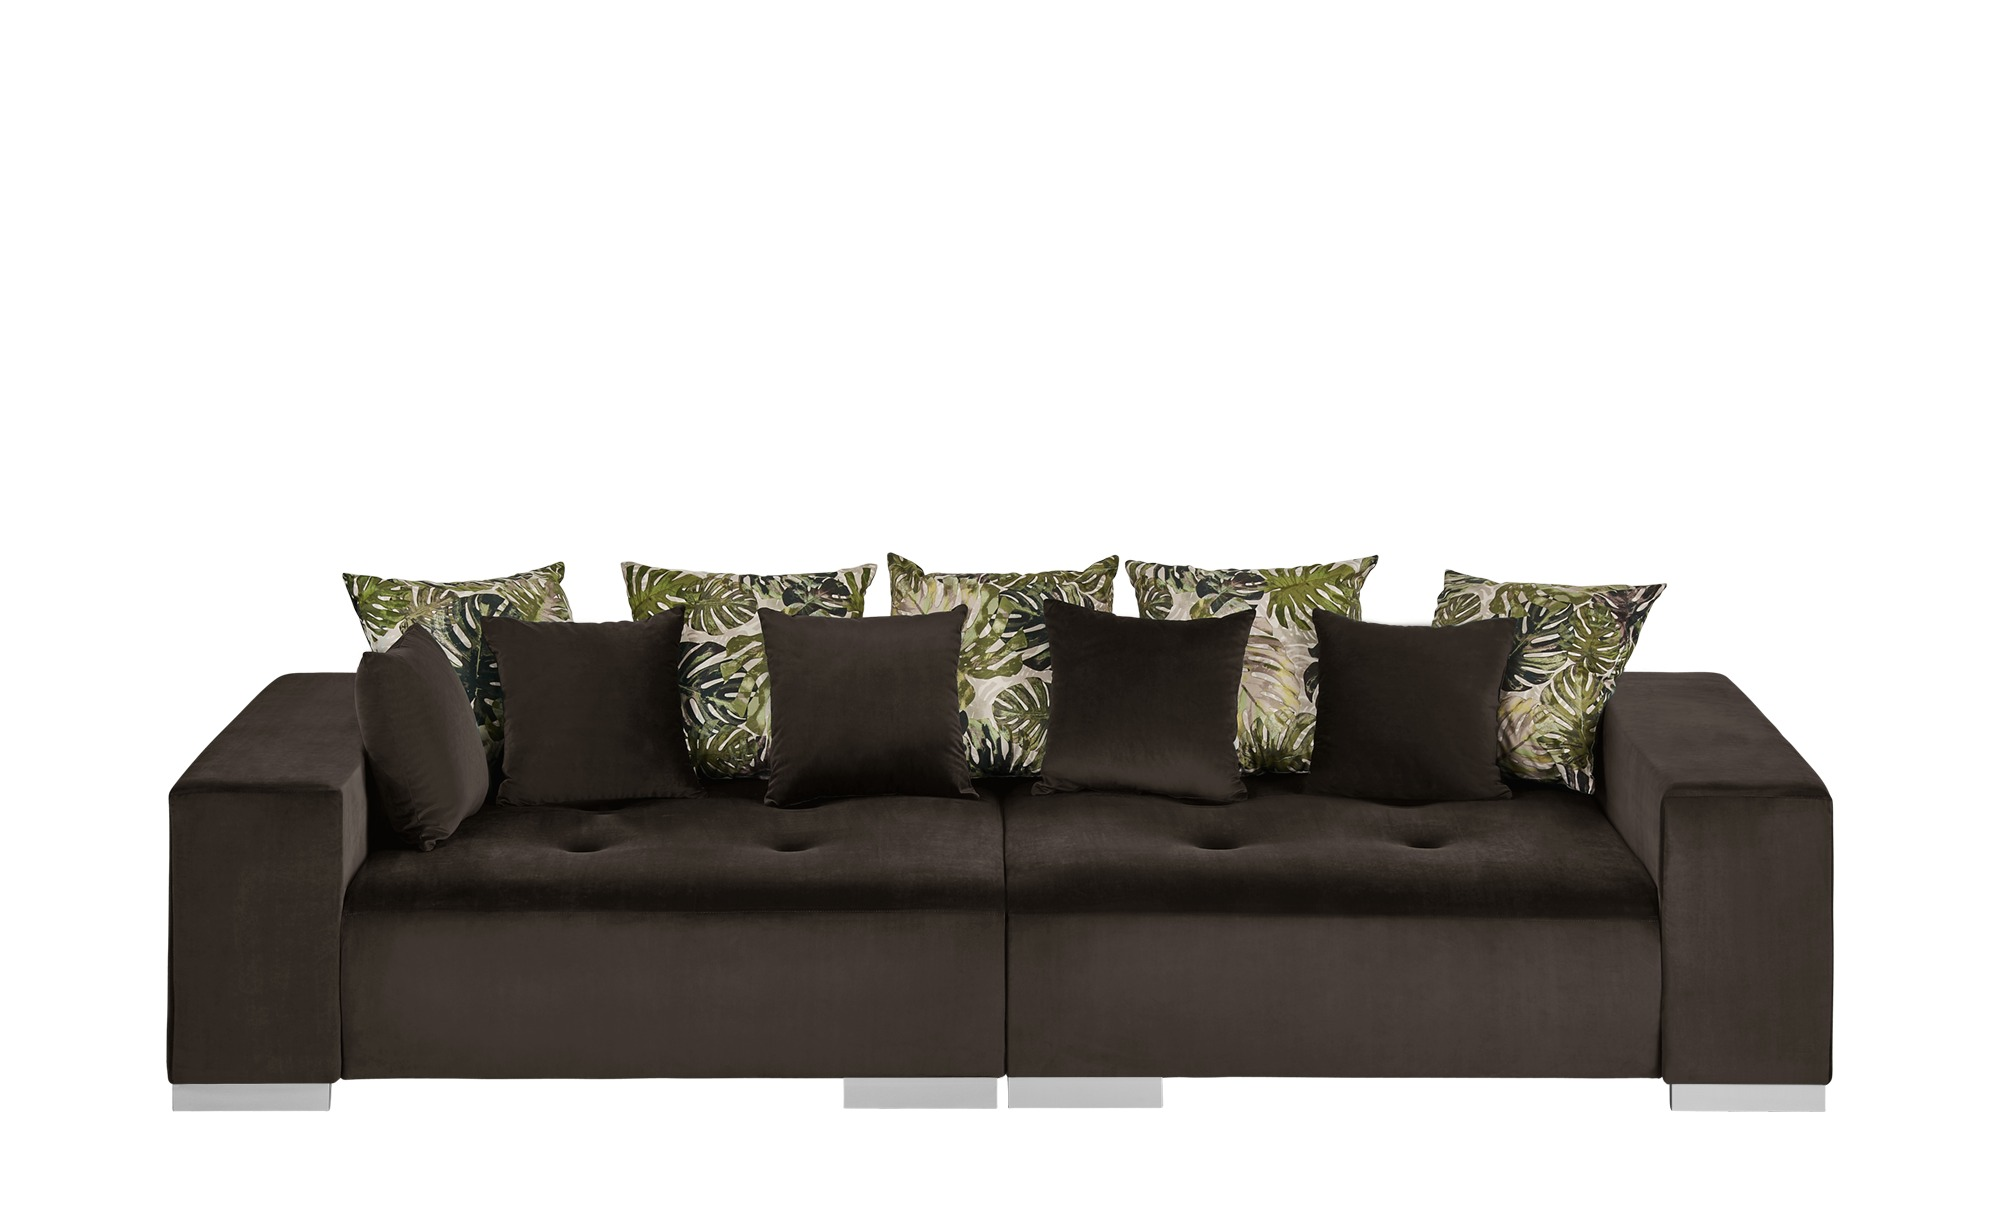 switch Big Sofa  Max ¦ braun ¦ Maße (cm): B: 300 H: 85 T: 136 Polstermöbel > Sofas > Big-Sofas - Höffner